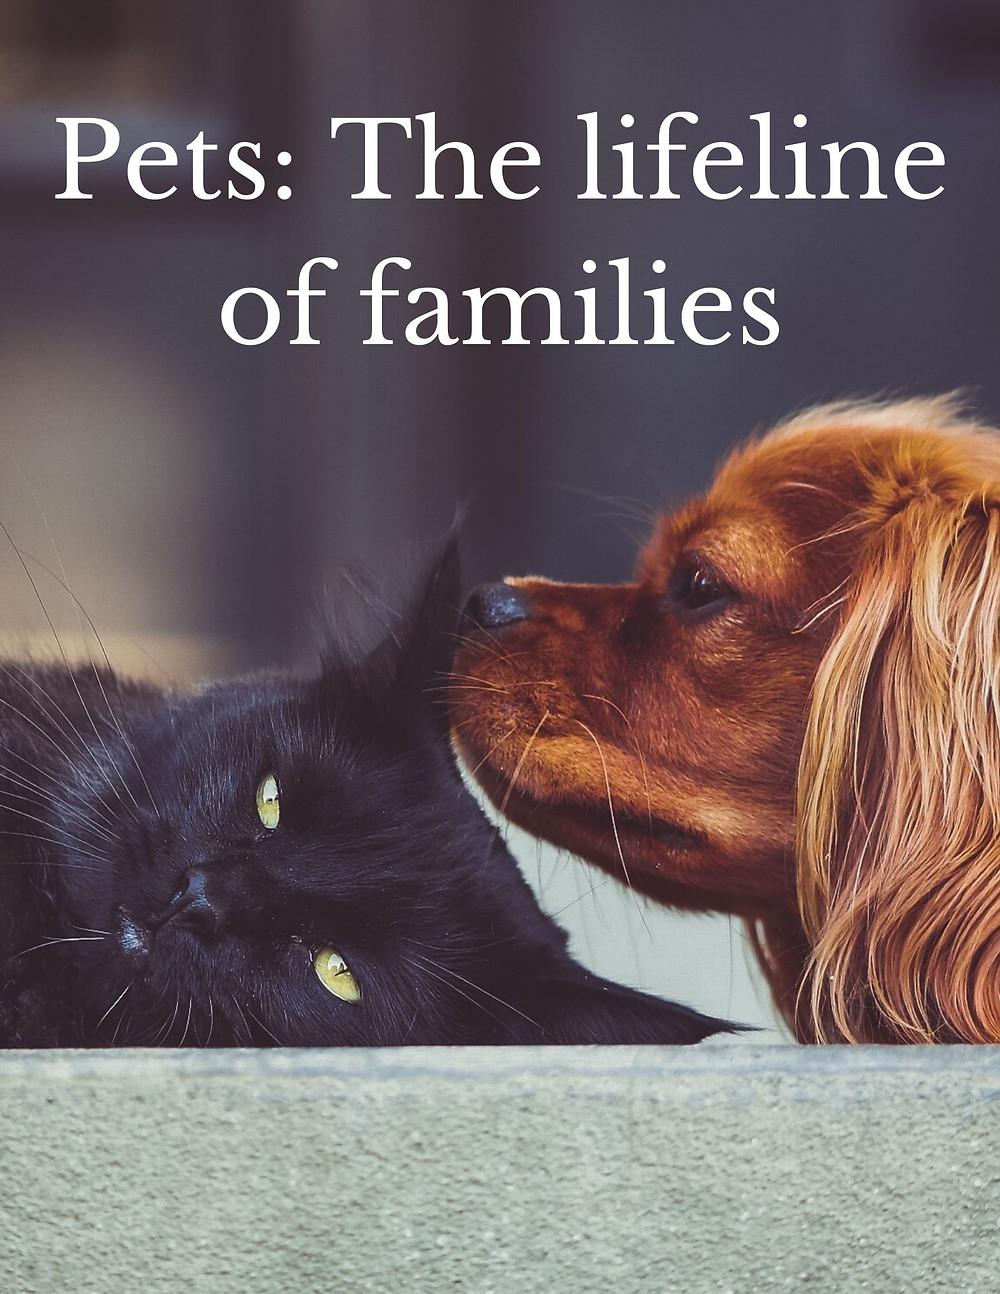 Pets: The lifeline of families